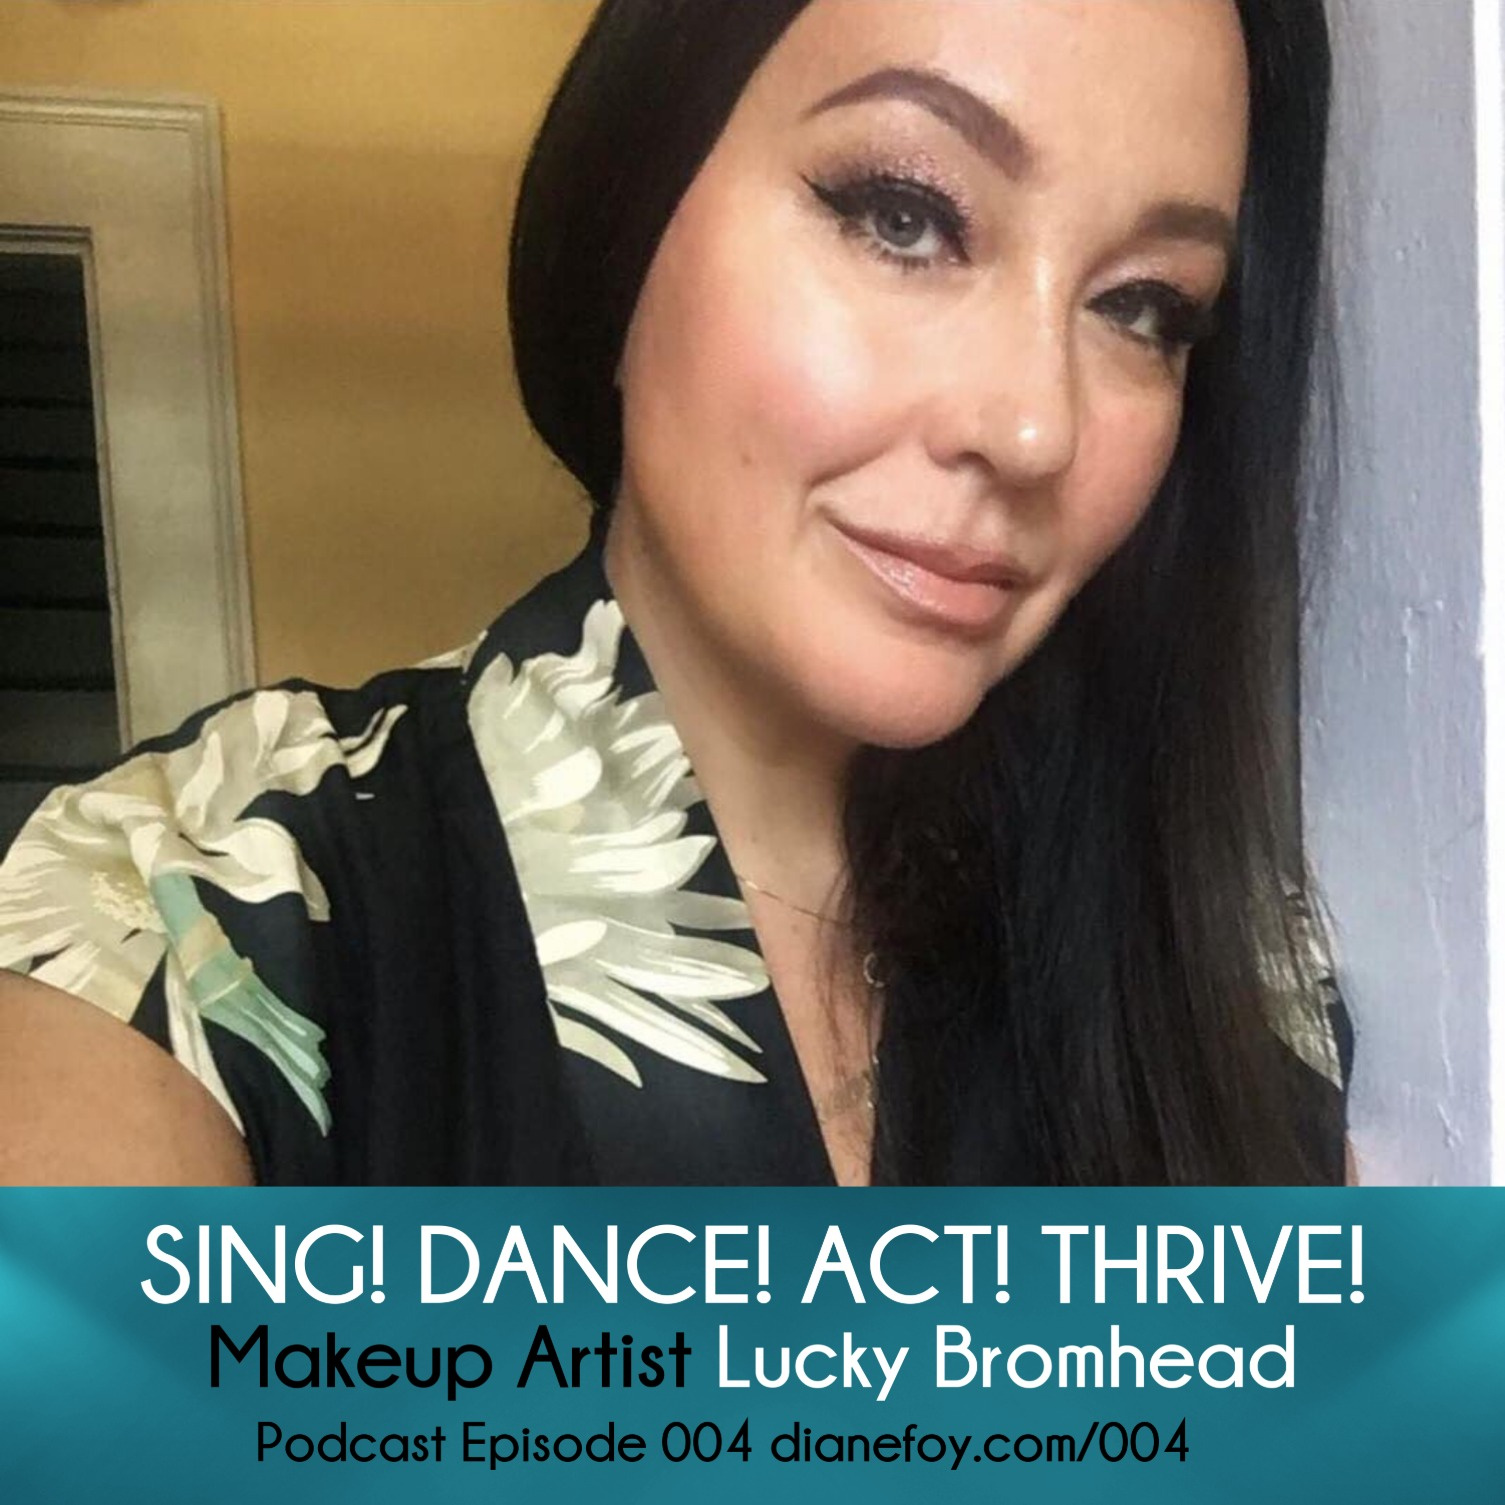 Lucky Bromhead, Makeup Artist